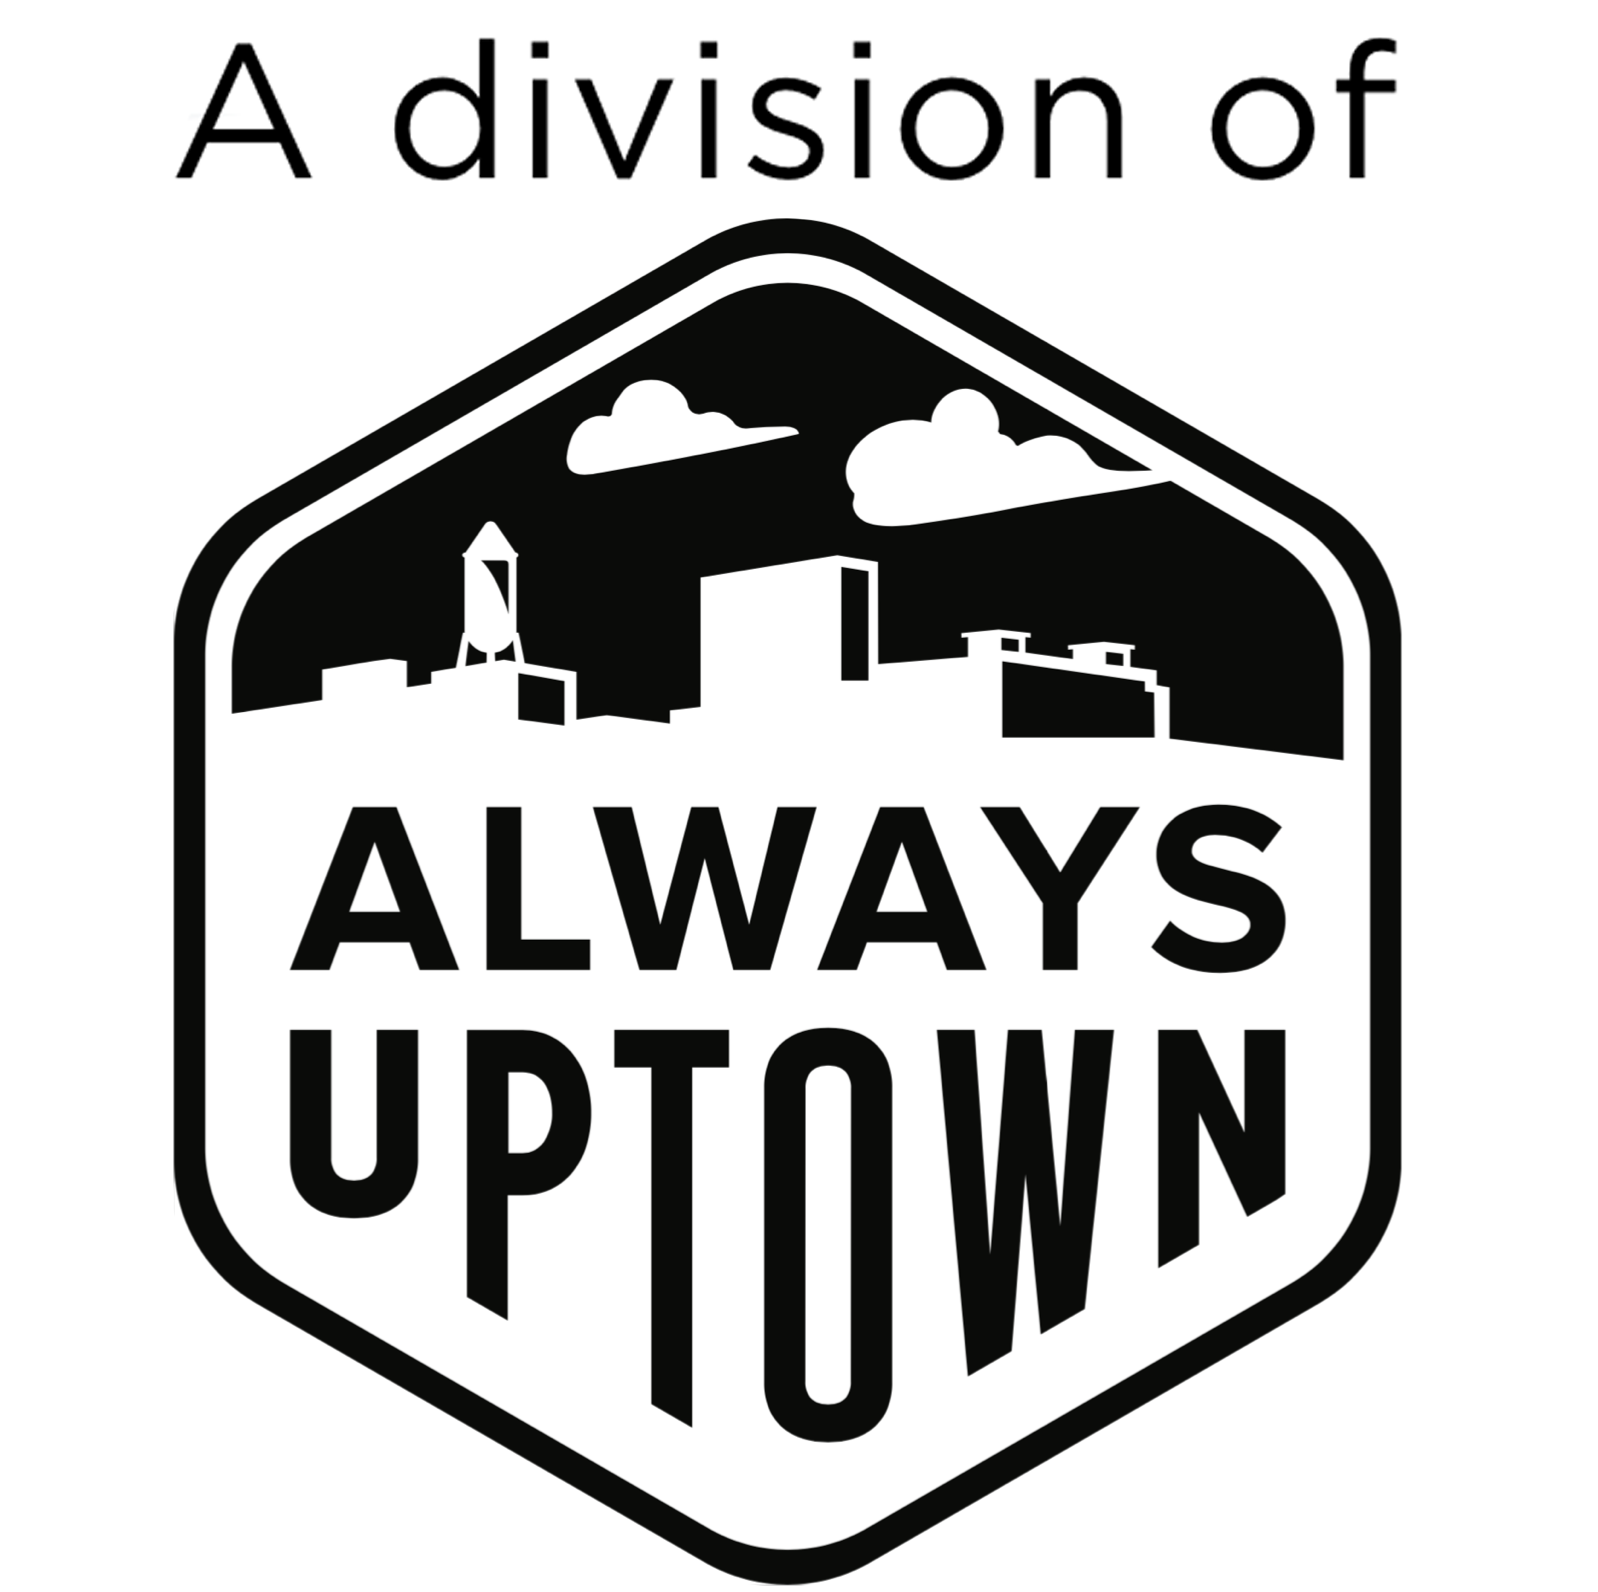 Uptown Black.png